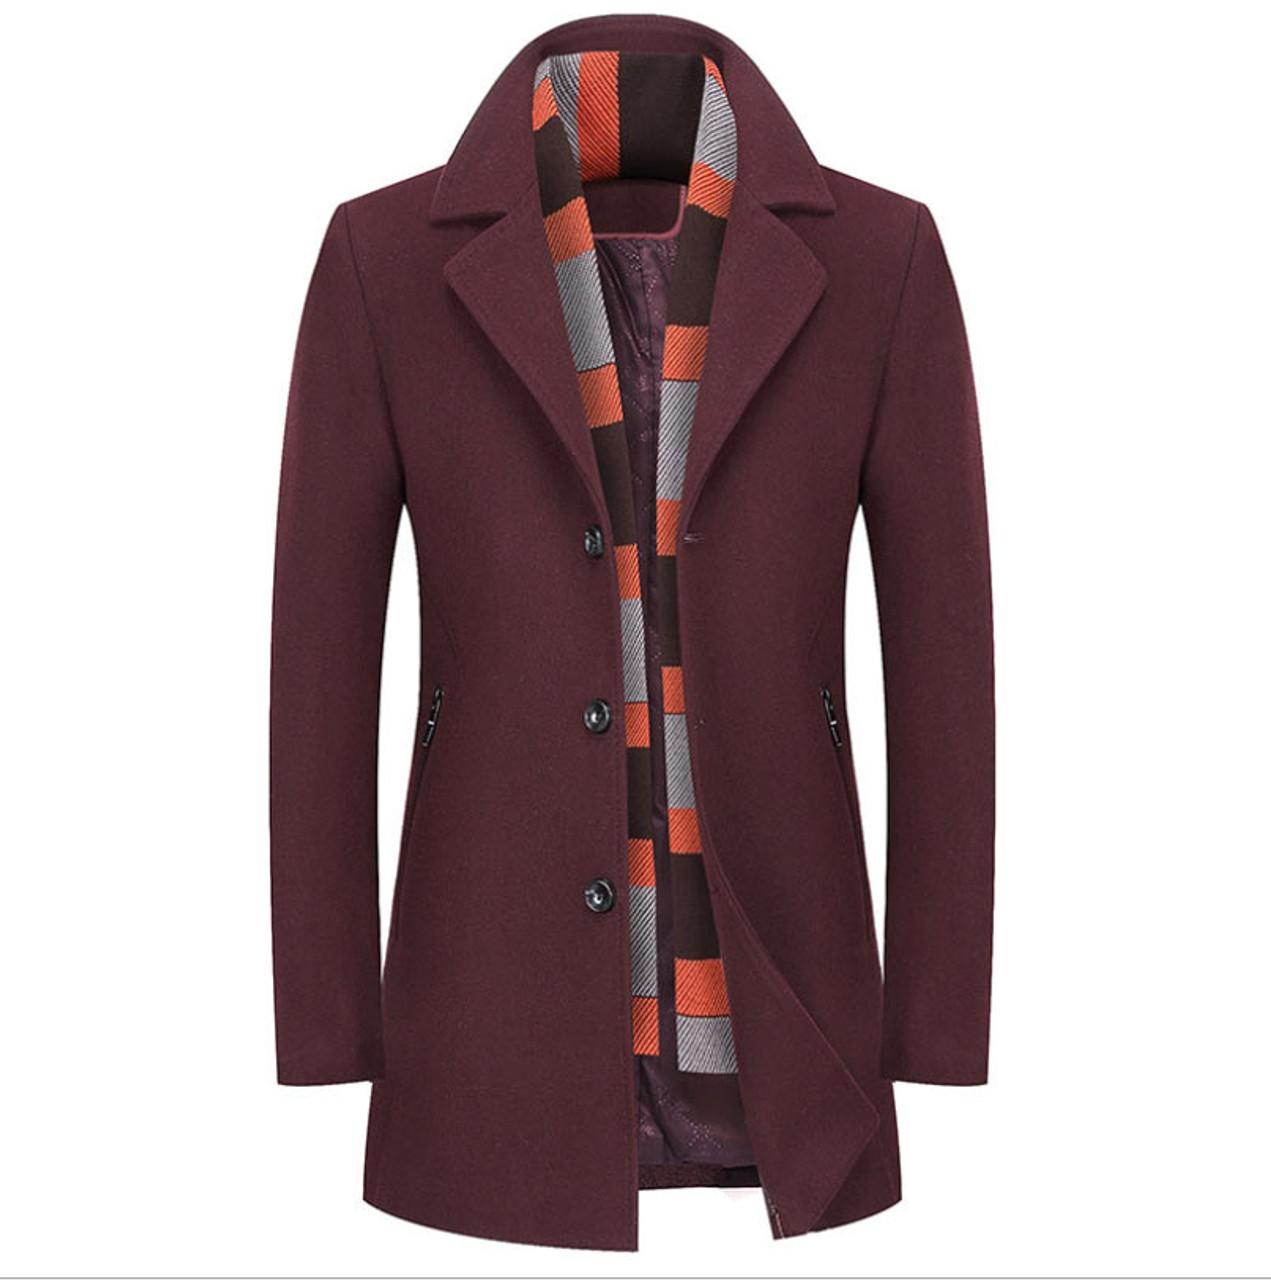 68ce00a0580 ... Mwxsd brand winter men s wool jackets men slim fit scarf collar Wool   amp  Blends male ...